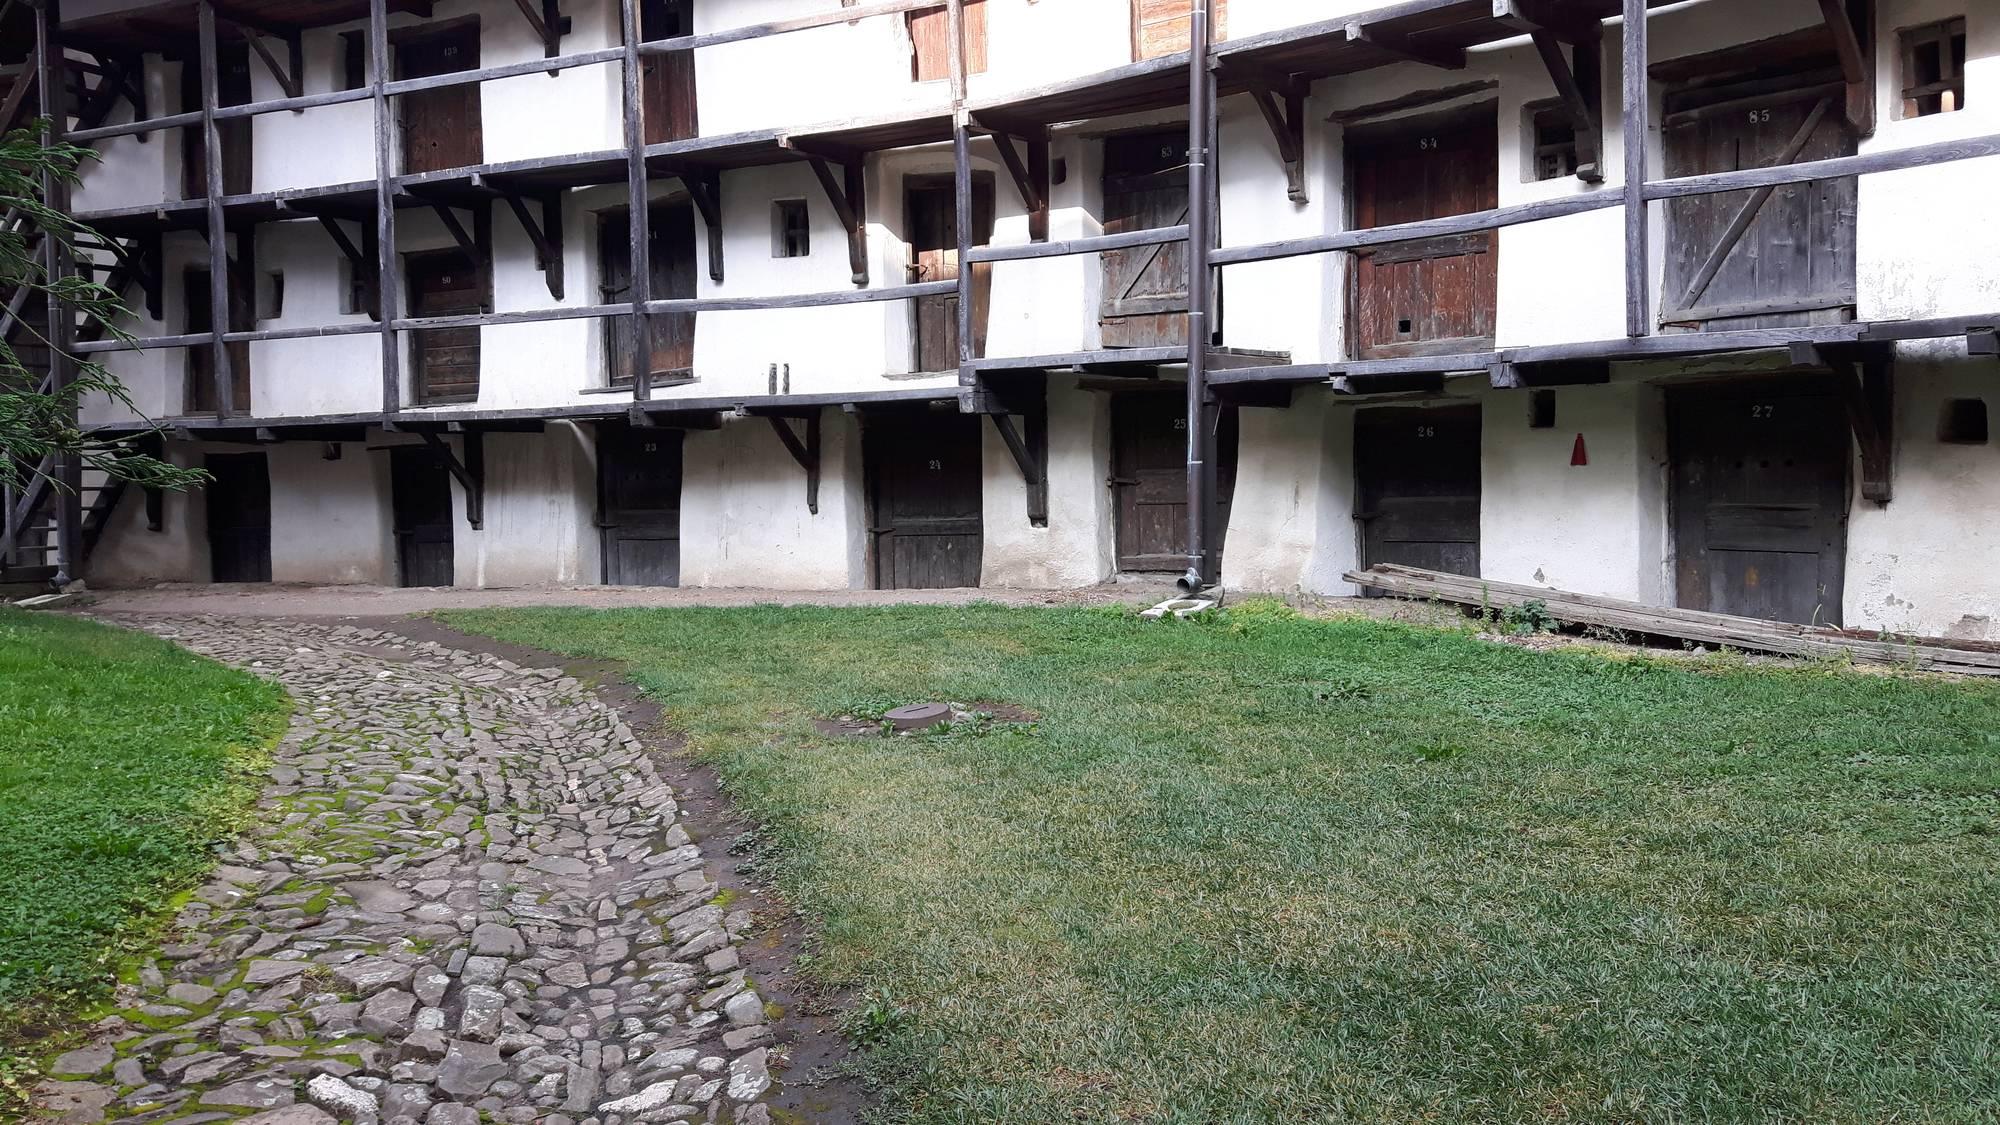 Eglise-fortifiee-Prejmer_07-09-2018_13